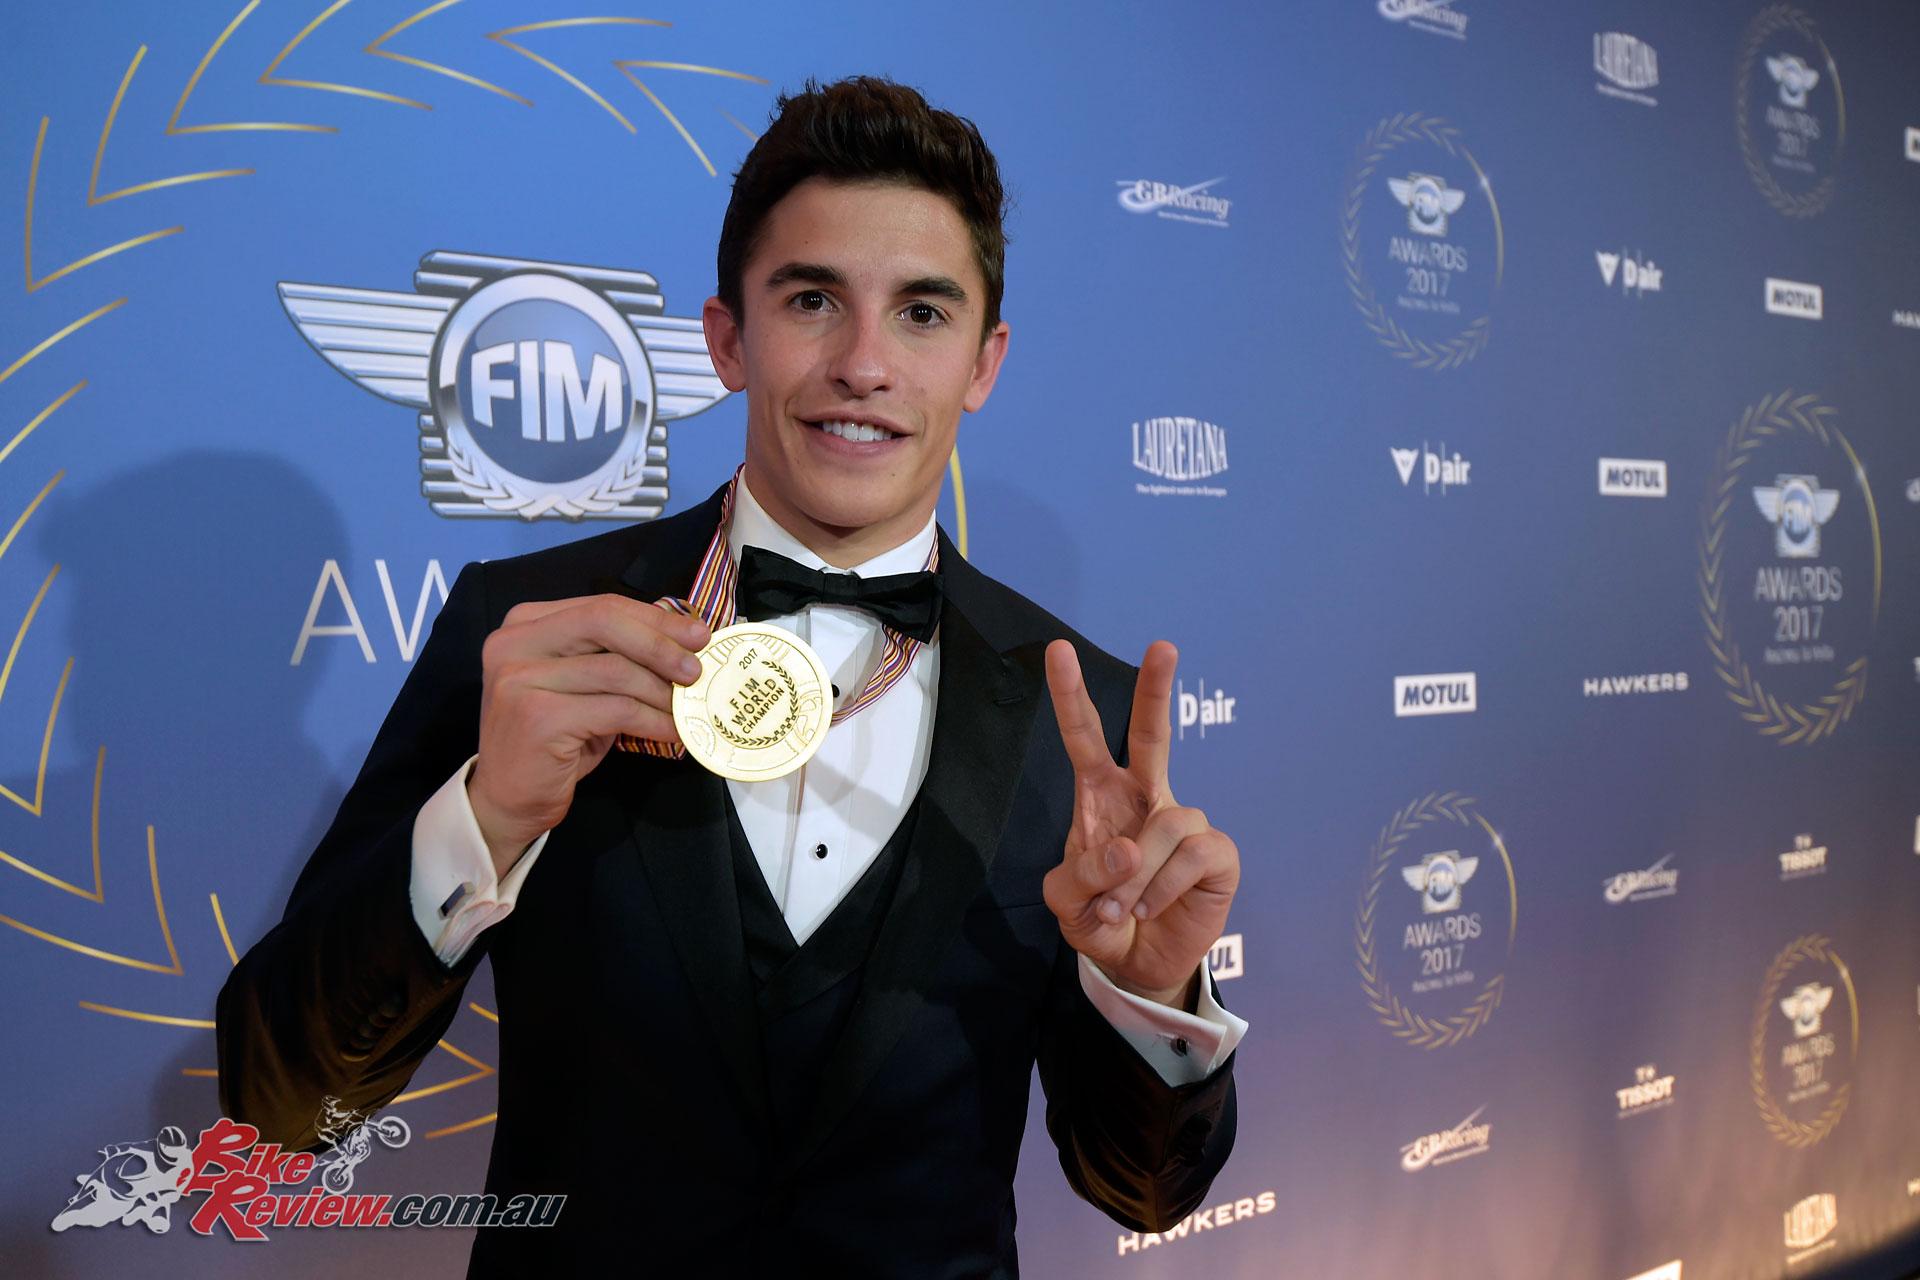 FIM Gala: 2017 World Champions awarded in Andorra - Bike Review